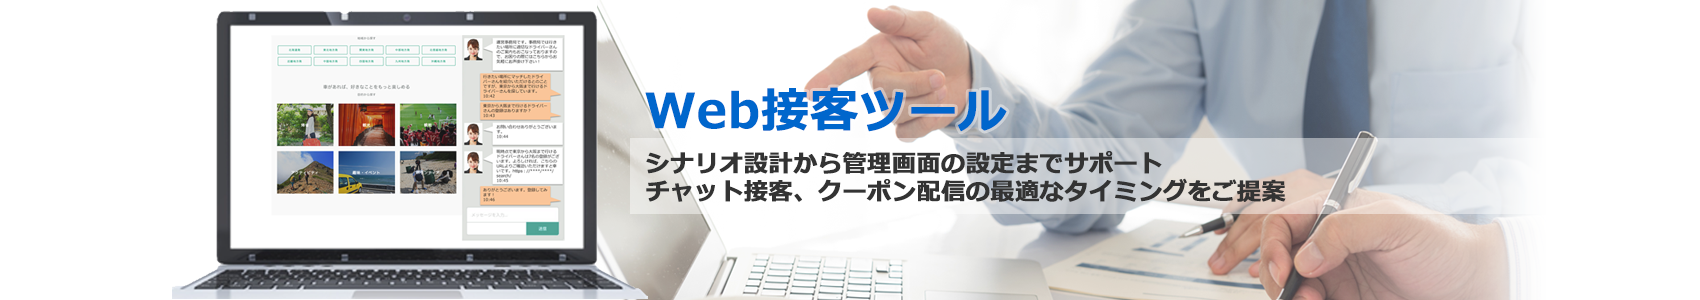 adishのWeb接客:導入サポートによるシナリオ設計から管理画面の設定までご提案します。